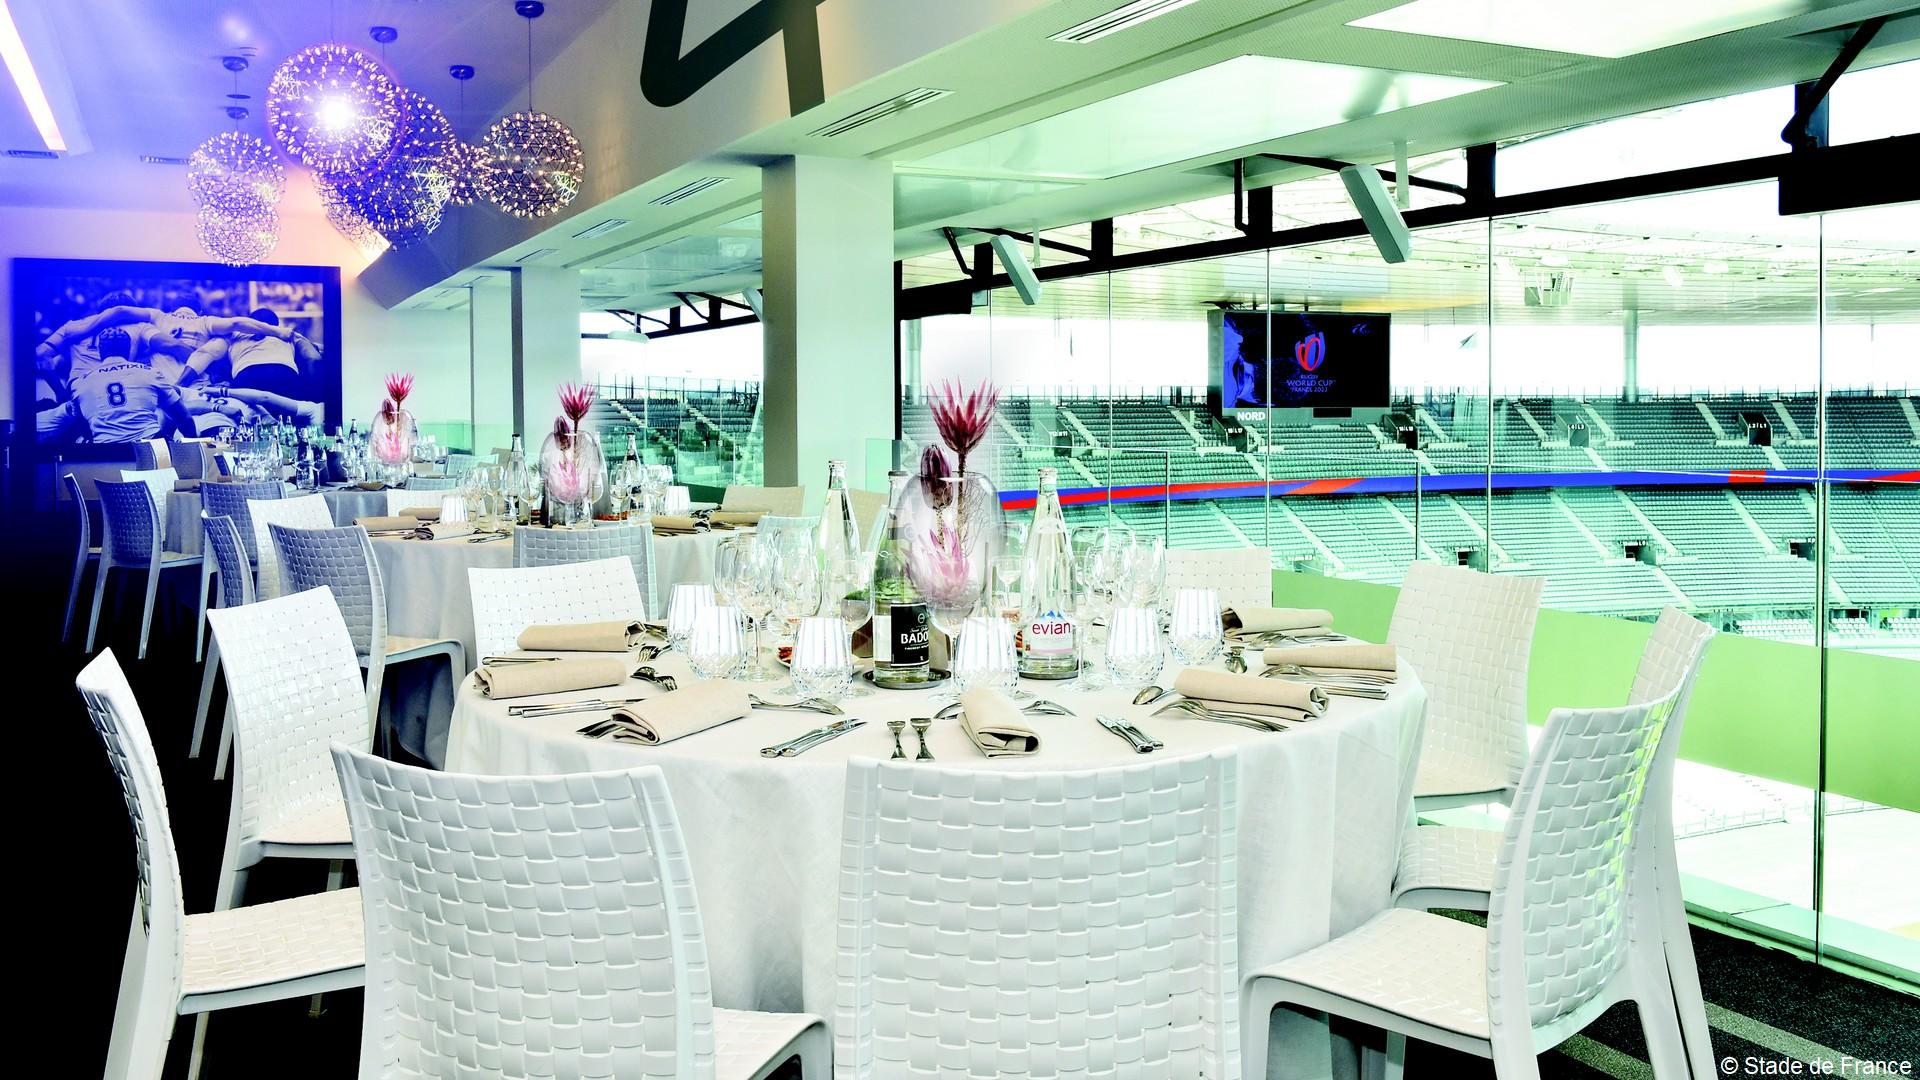 Stade de France (2) Hospitalité France 2023